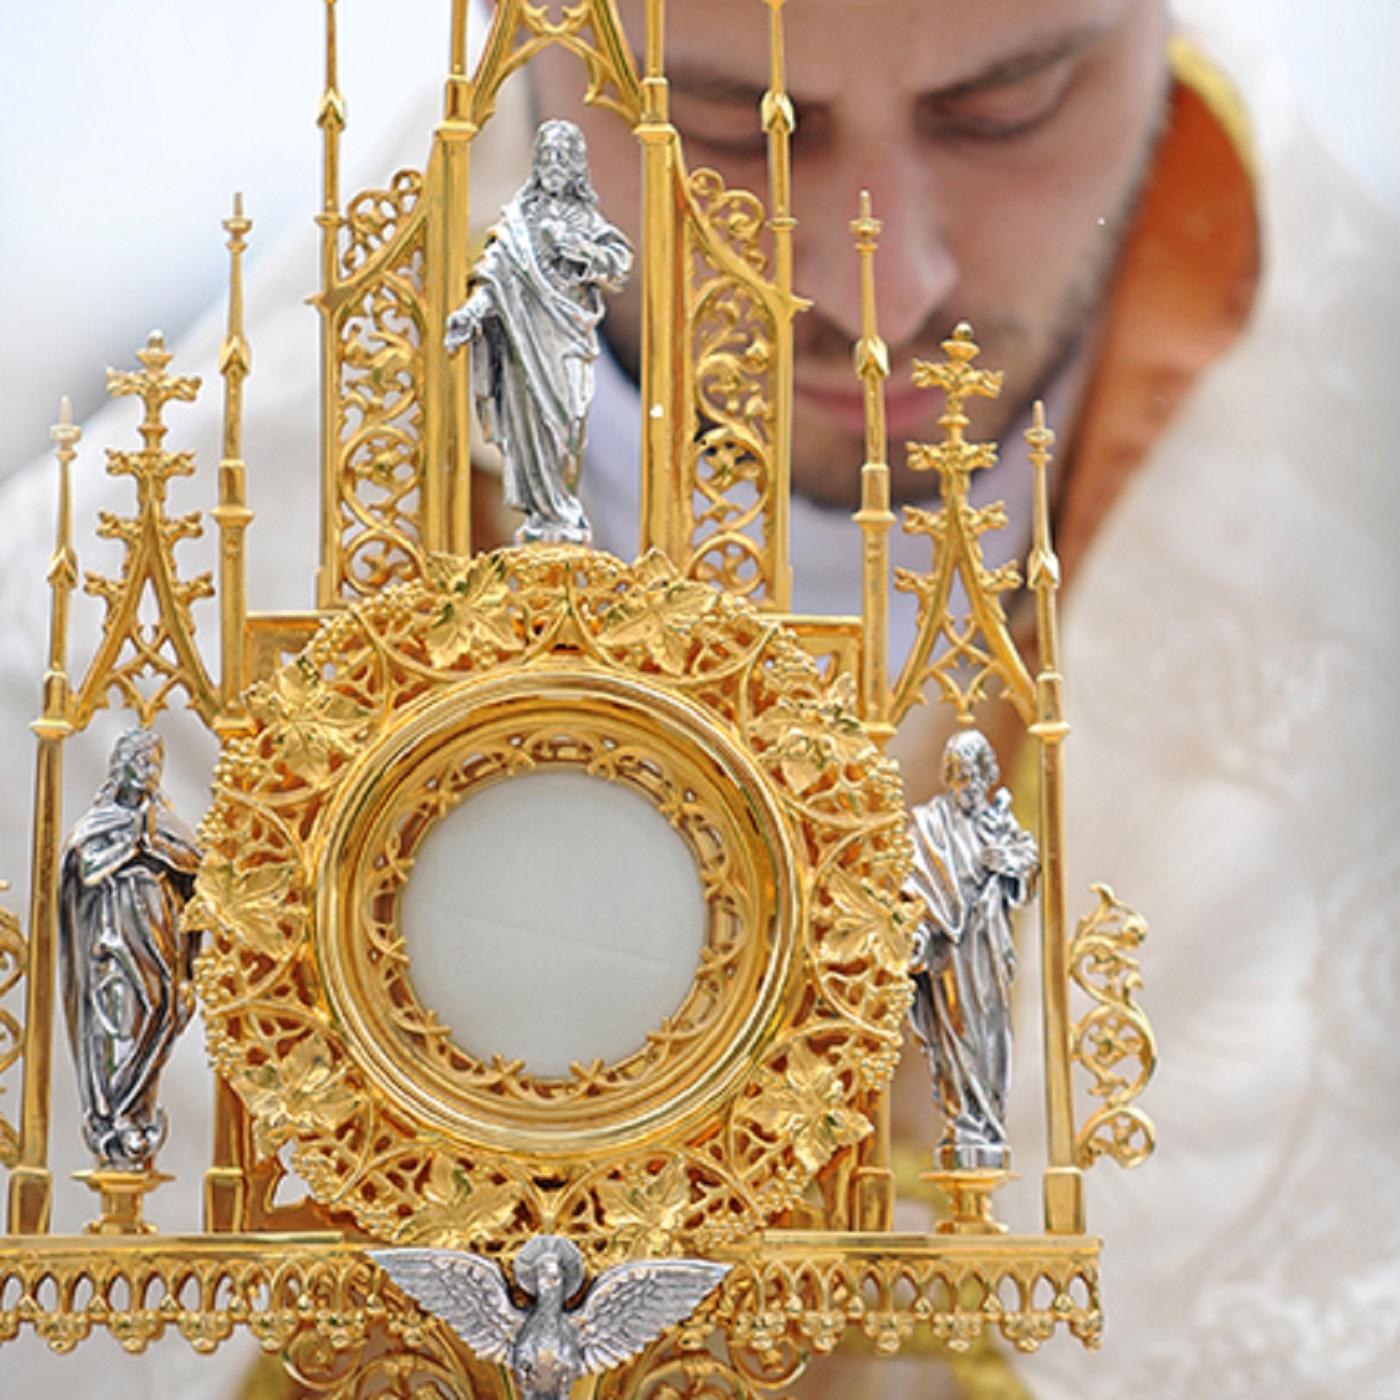 Fr. Craig Giera/Homilies show art